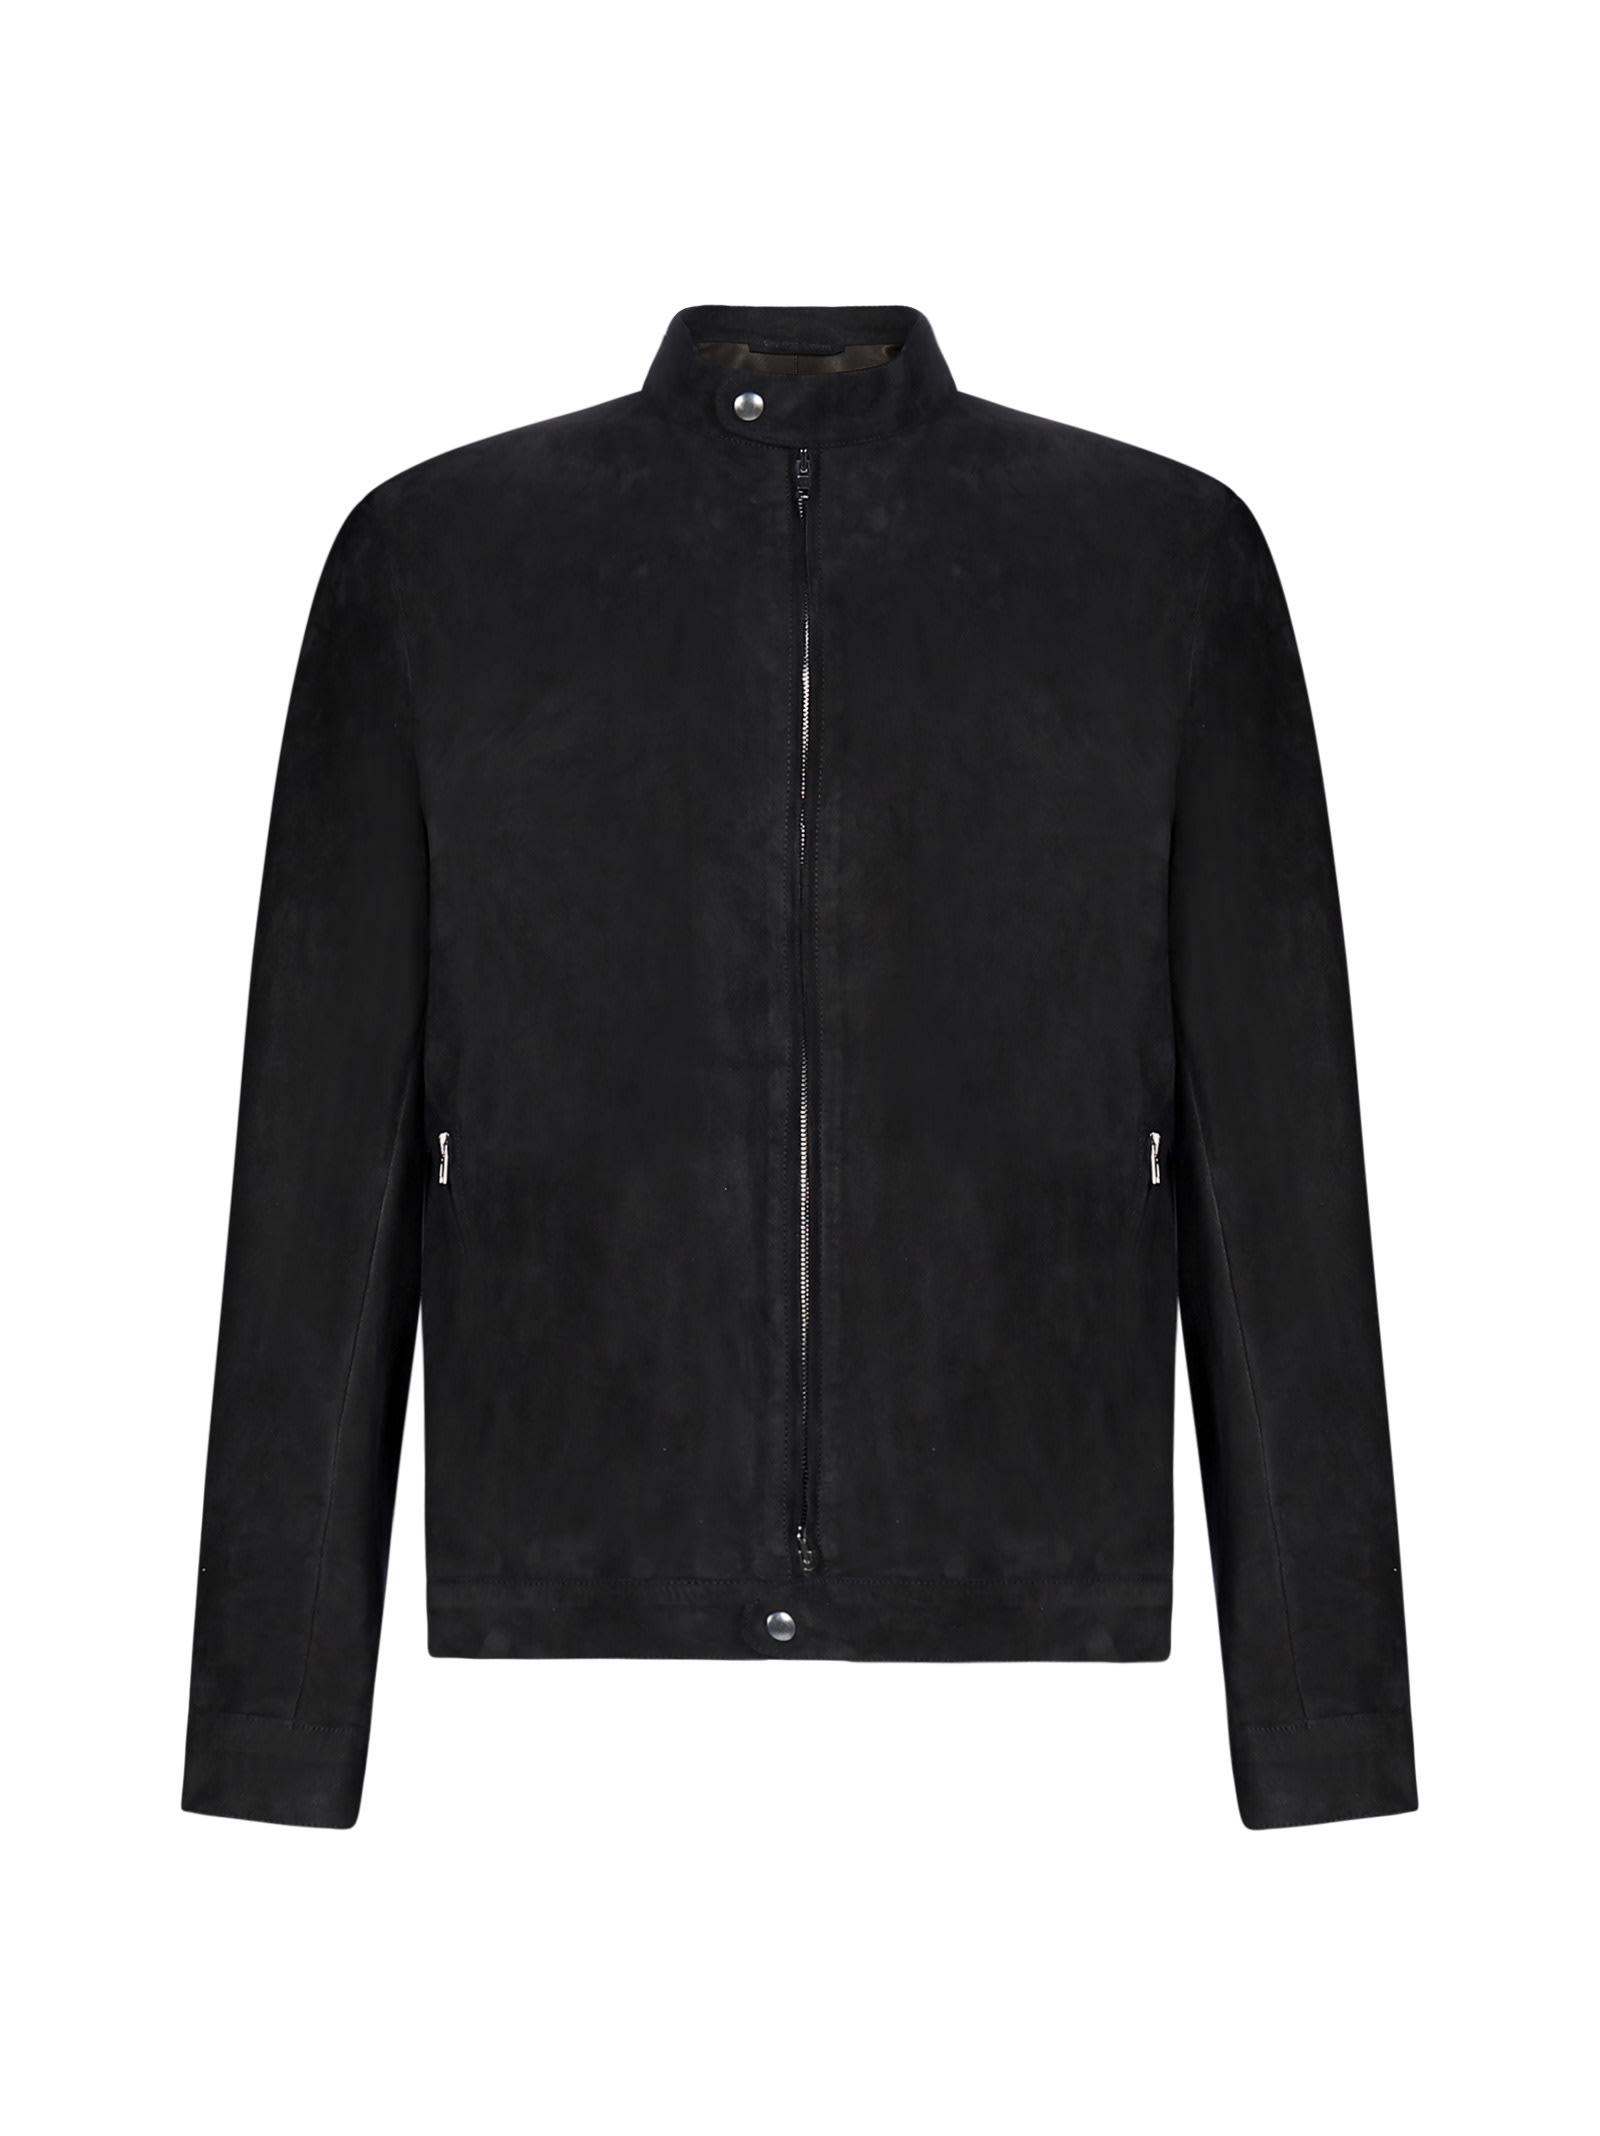 Salvatore Santoro Bomber jackets JACKET